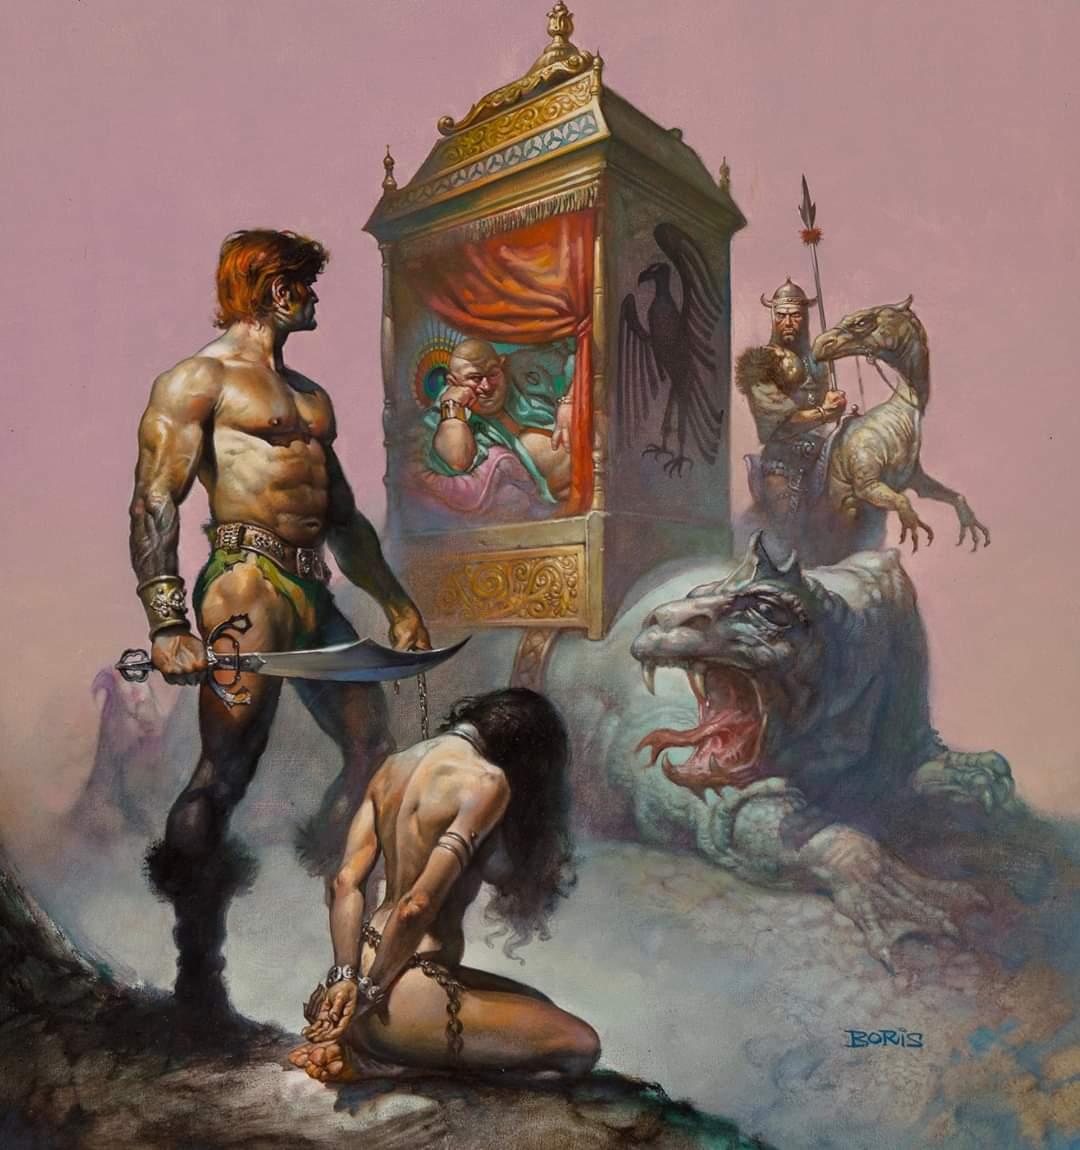 Boris Vallejo Tarnsman of Gor book cover art (1977)